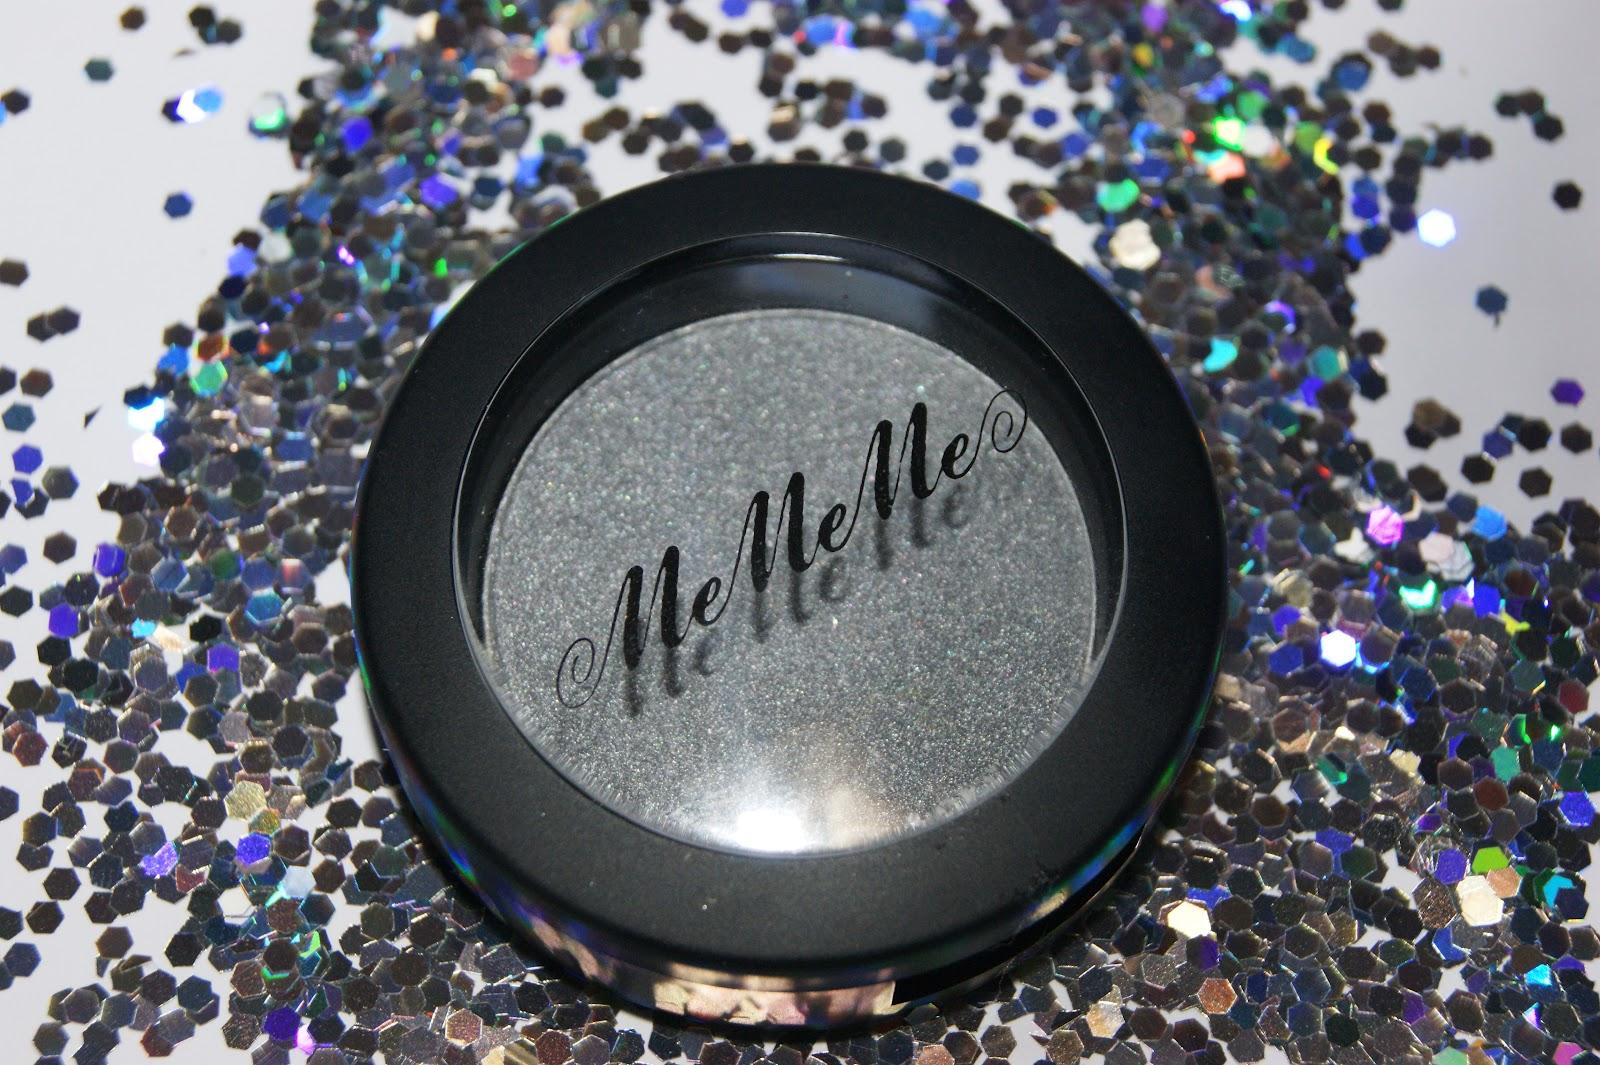 Mememe Mono Eyeshadow in Steel - Review   The Sunday Girl